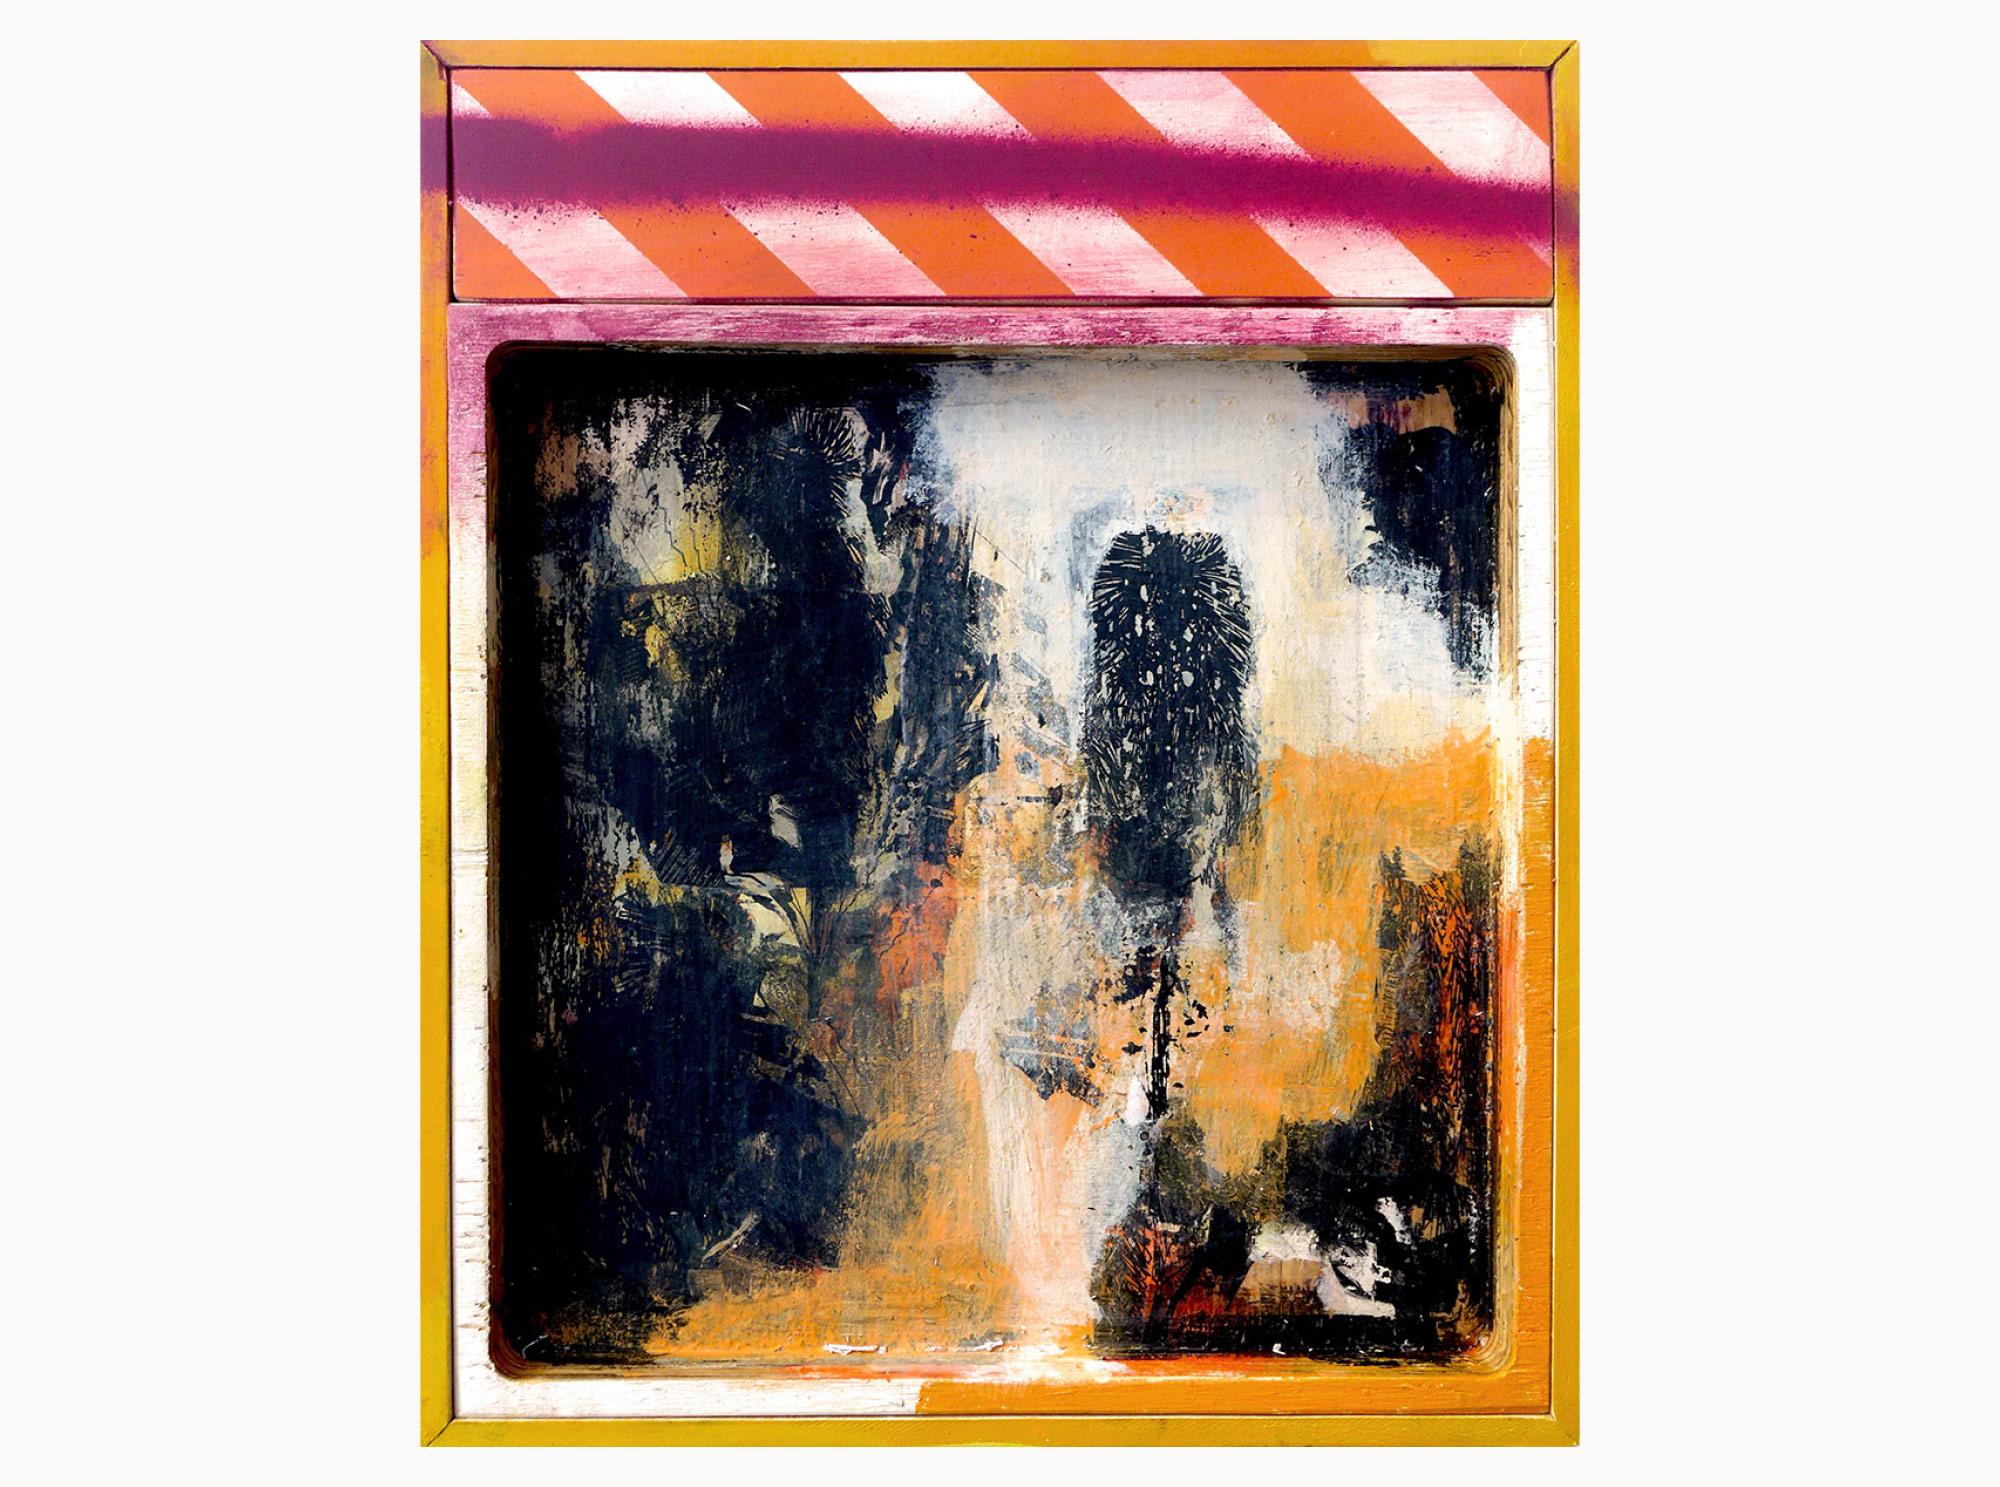 Banskia vandalism,  2015, acrylic, aerosol, wood, 35 x 45 cm